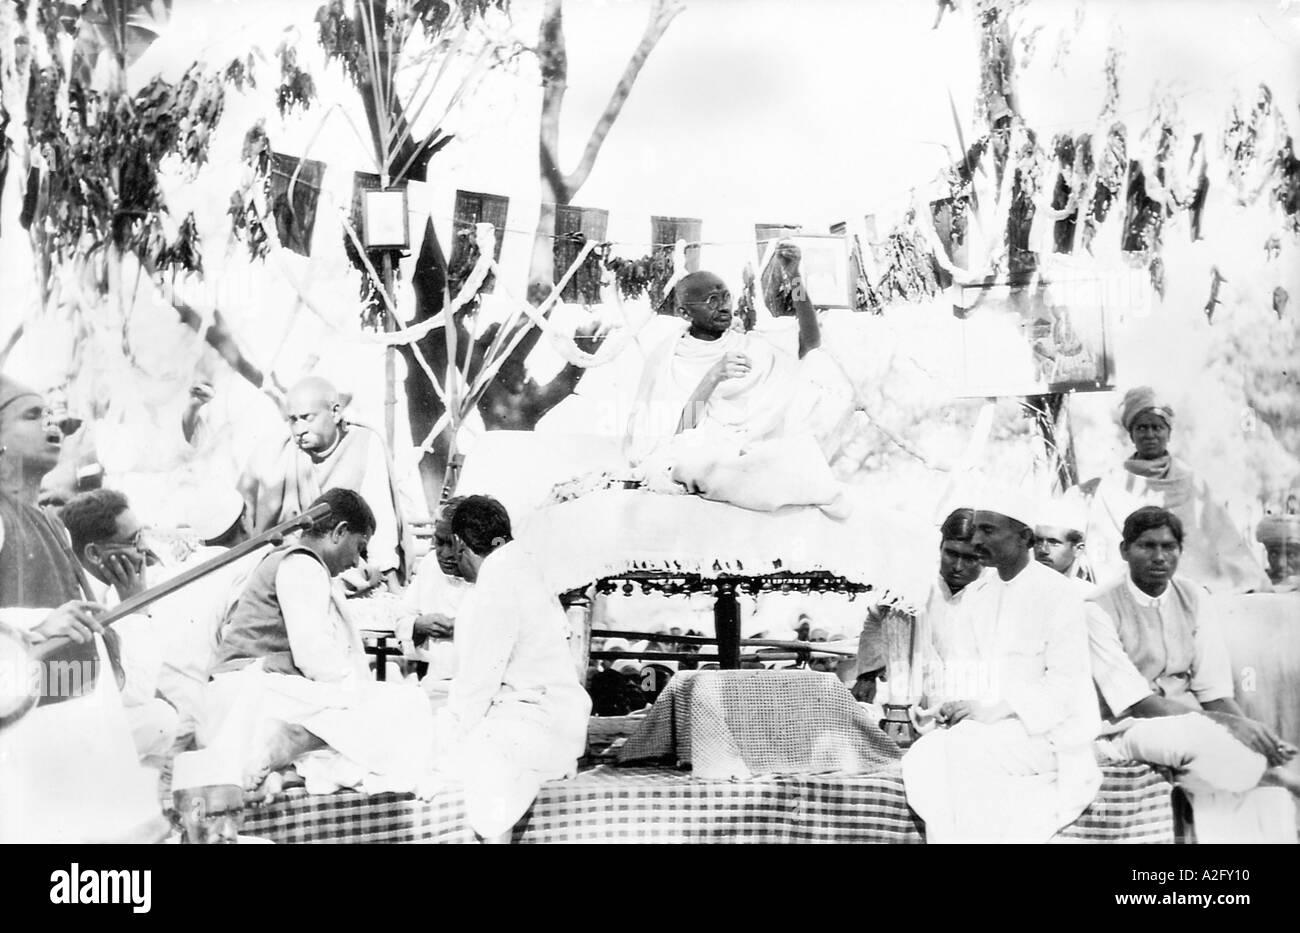 MKG33036 Mahatma Gandhi plying his takli spindle at a public meeting India 1929 - Stock Image